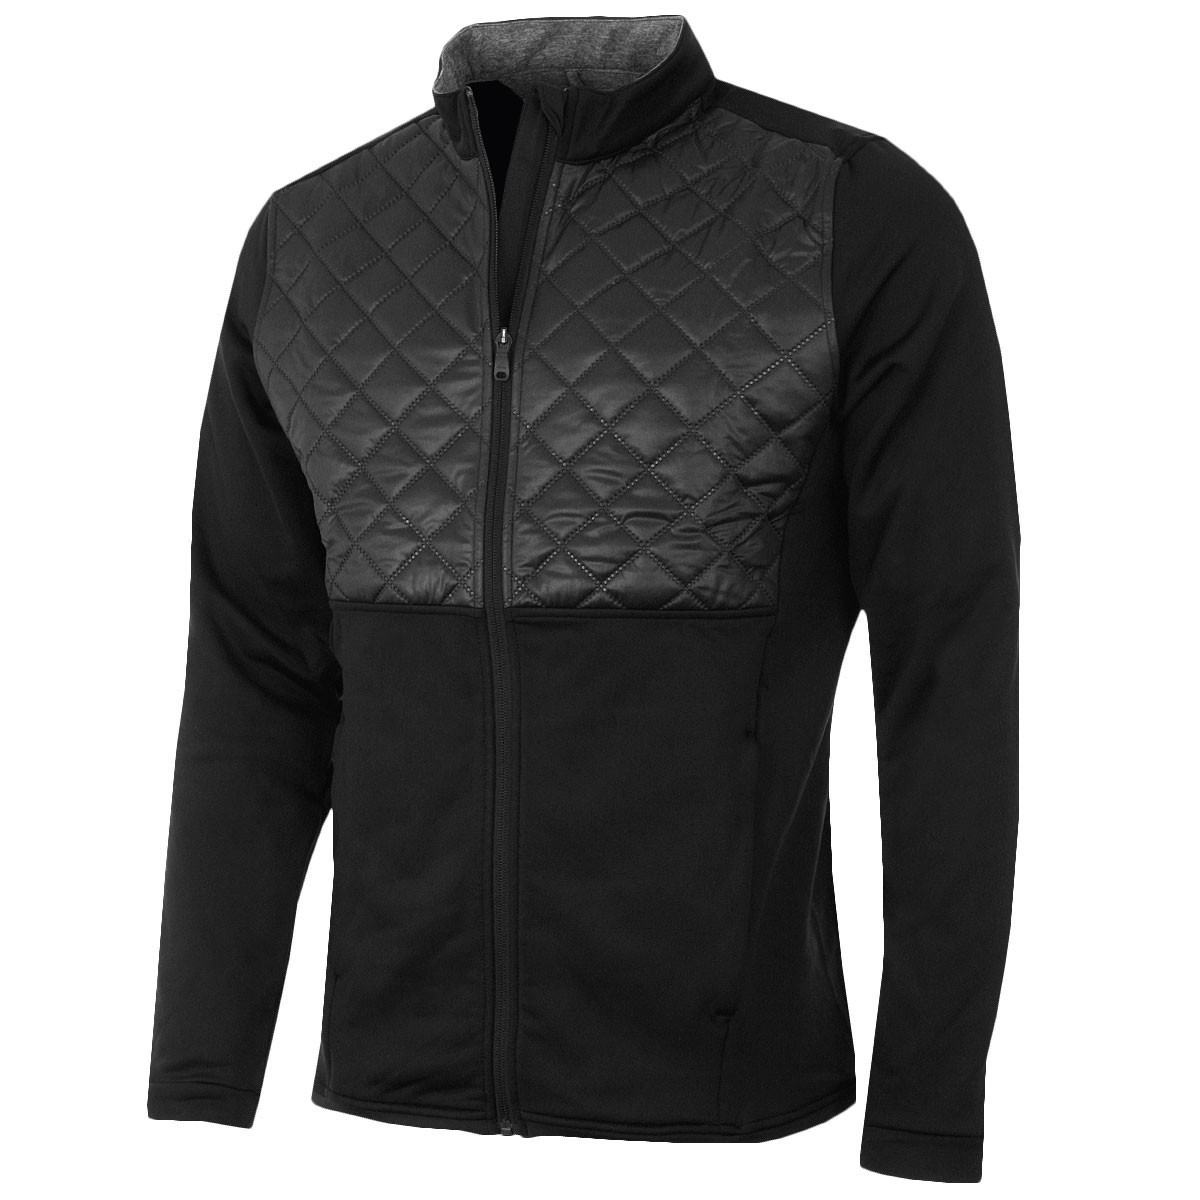 c88a36f62 Adidas Golf 2016 Mens ClimaHeat Prime Fill Thermal Jacket - Adidas ...